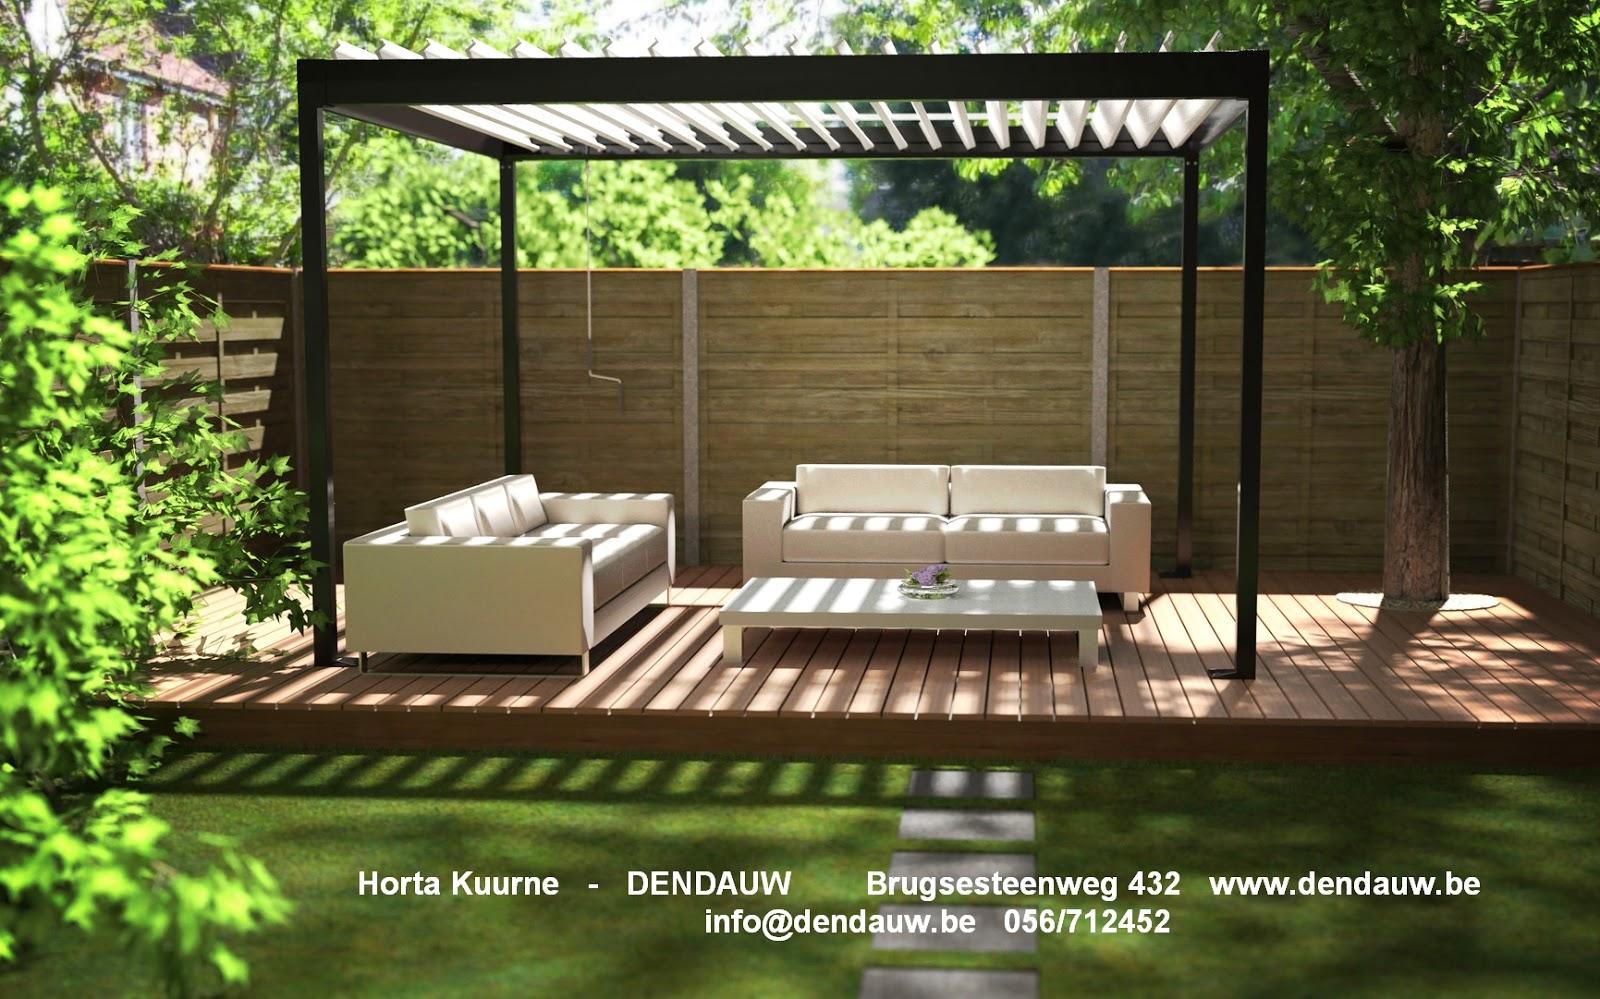 Horta dendauw kuurne vrijstaande pergola in aluminium met roteerbare daklamellen azore - Aluminium pergola met schuifdeksel ...